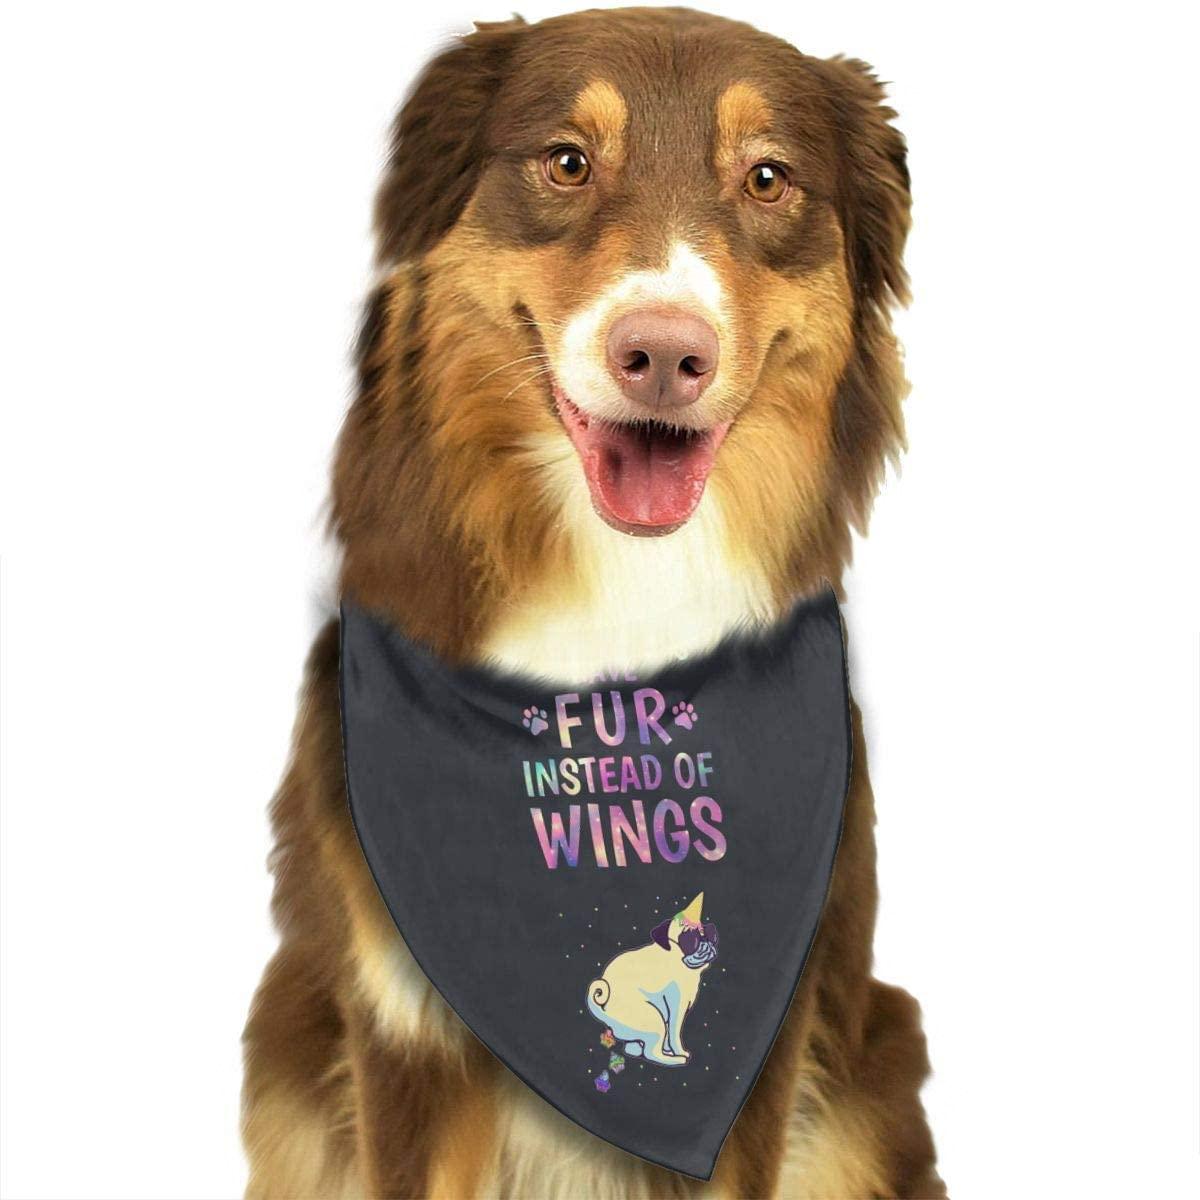 CHAN03 Dogs Bandana Collars Pug Dog and Icescream Pets Triangle Neckerchief Puppy Bibs Scarfs Cats Scarfs Towel